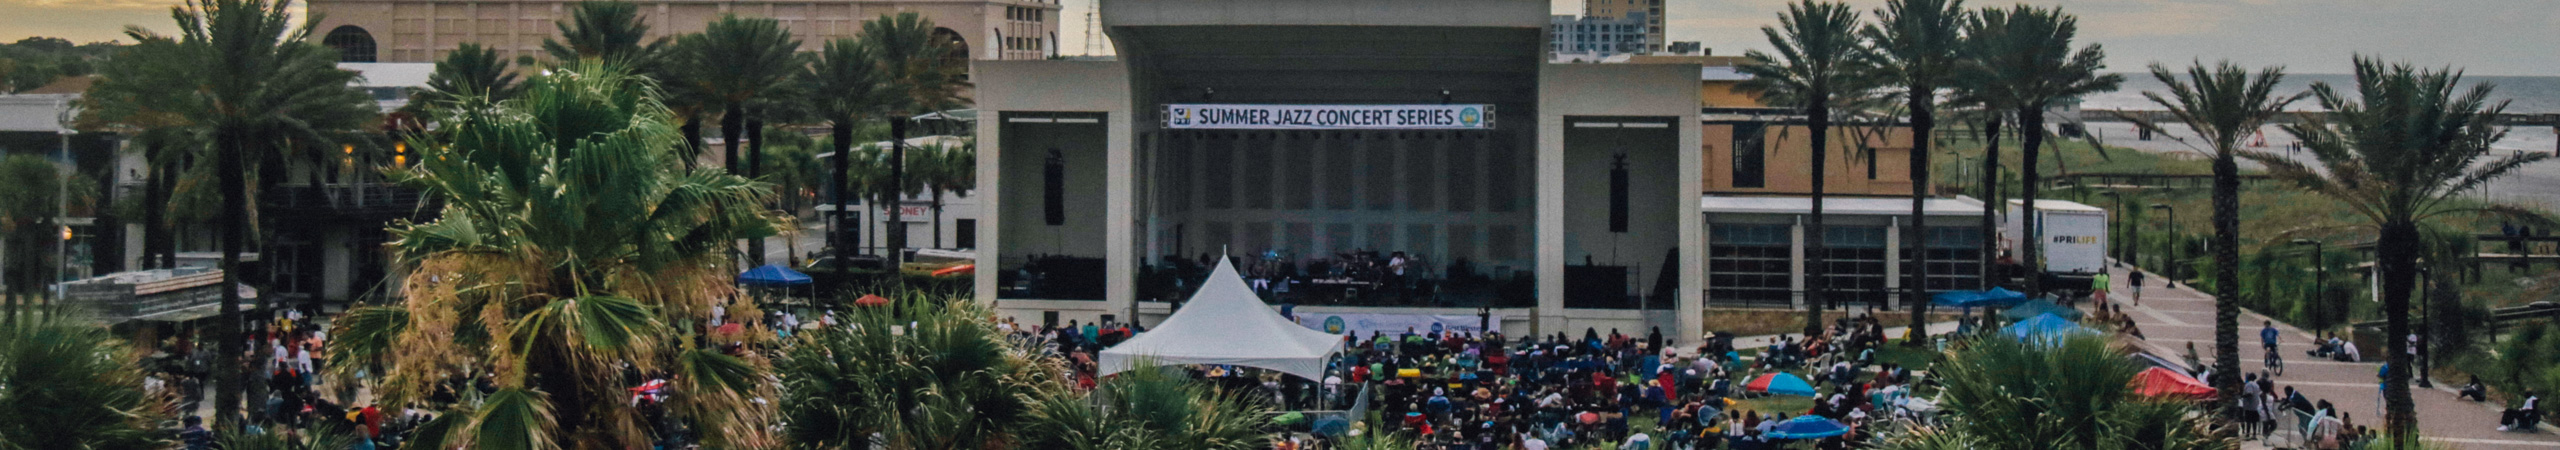 Summer Jazz Concert Series 2019